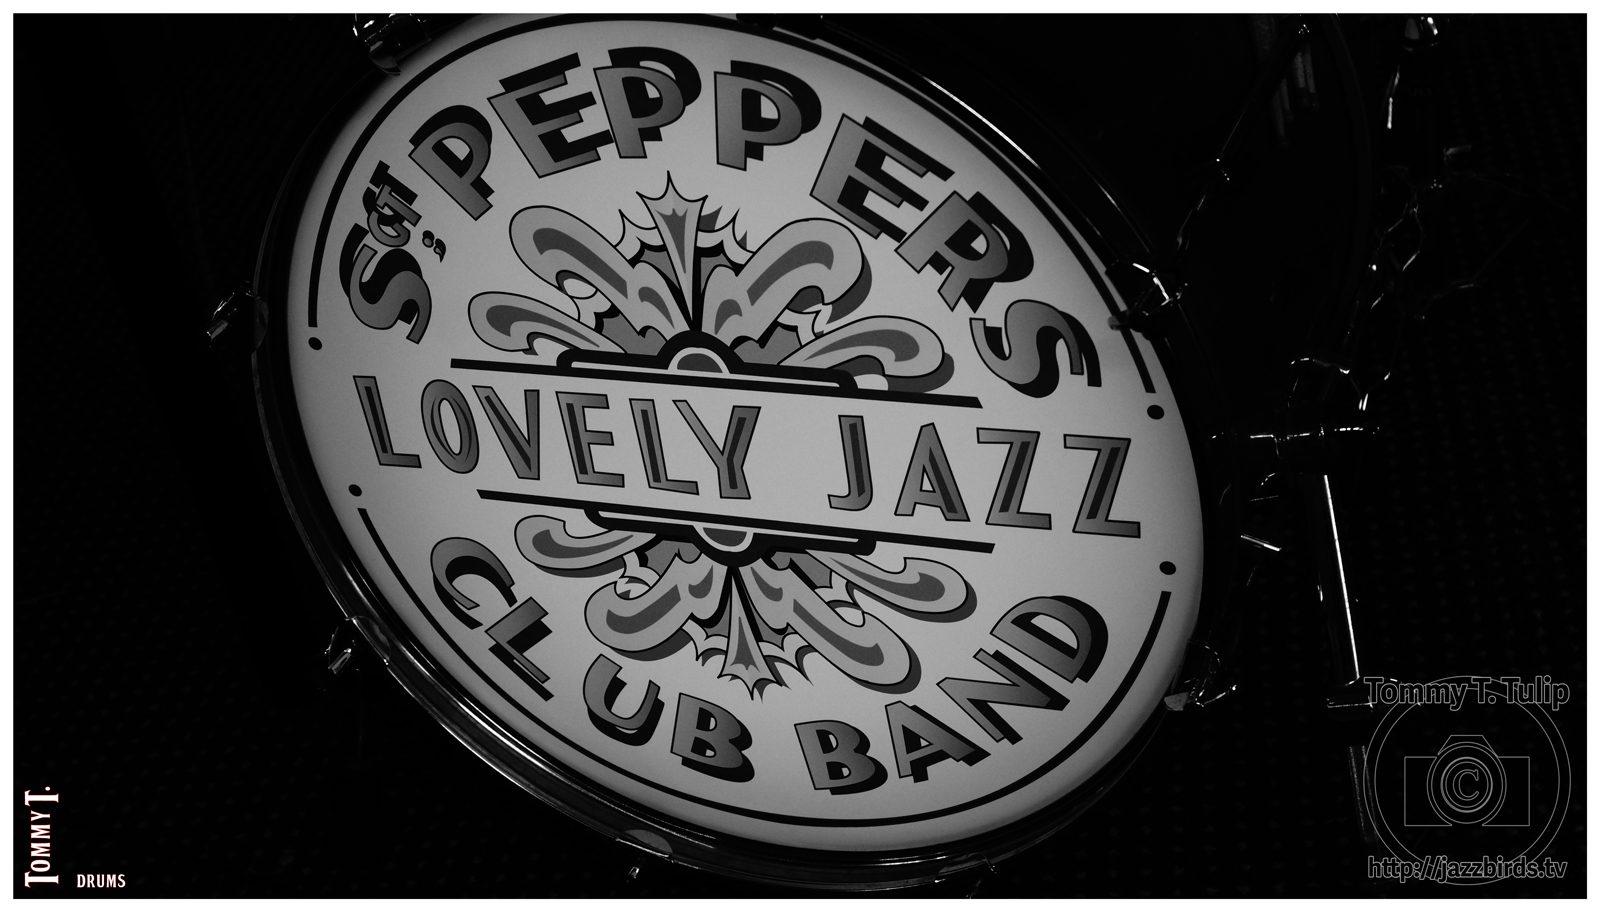 #Jazzbirds #Tommy #drums